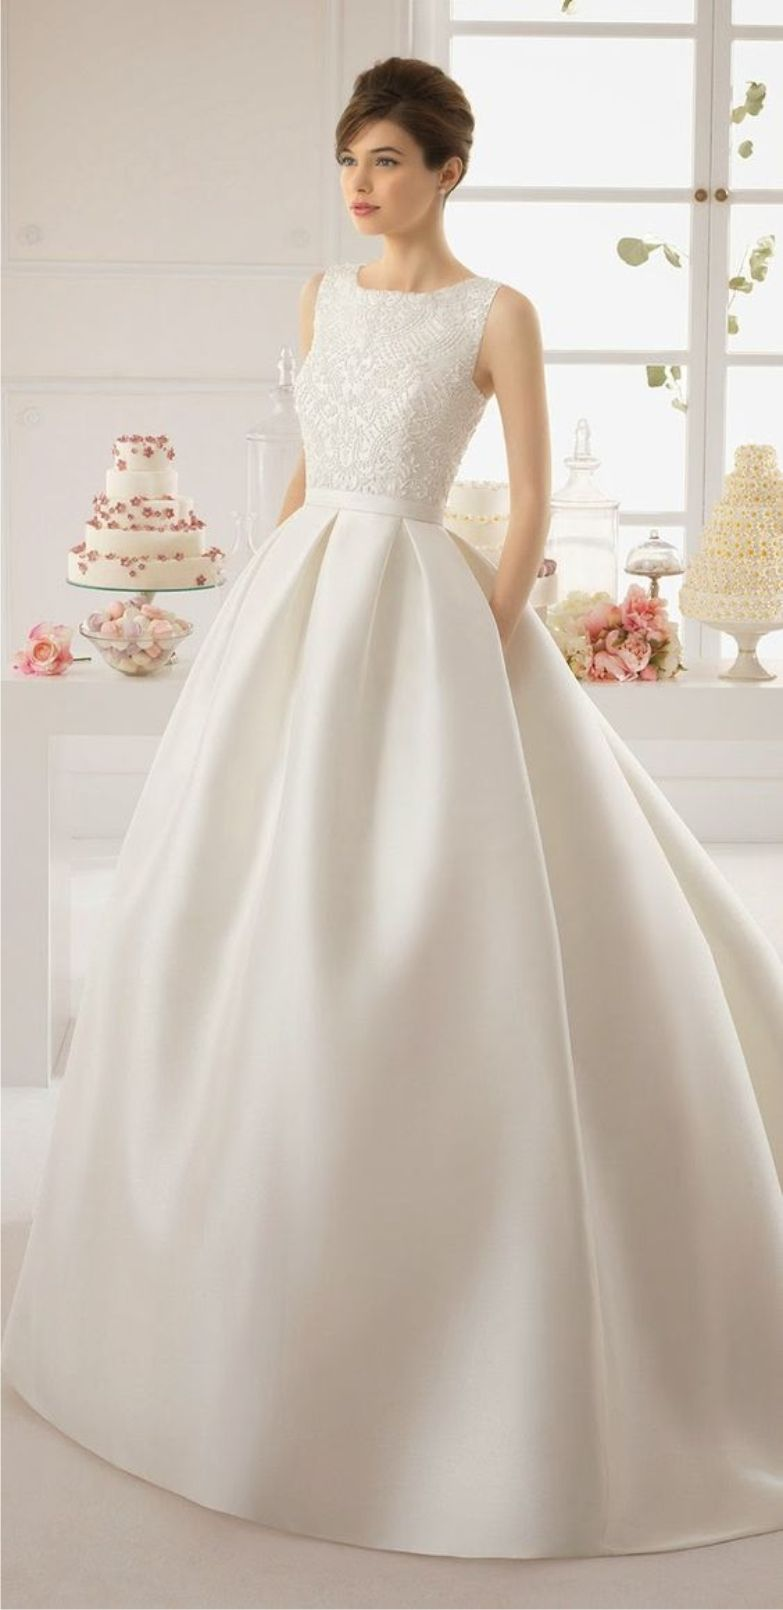 low budget wedding ideas!!! | wedding, classic wedding dress